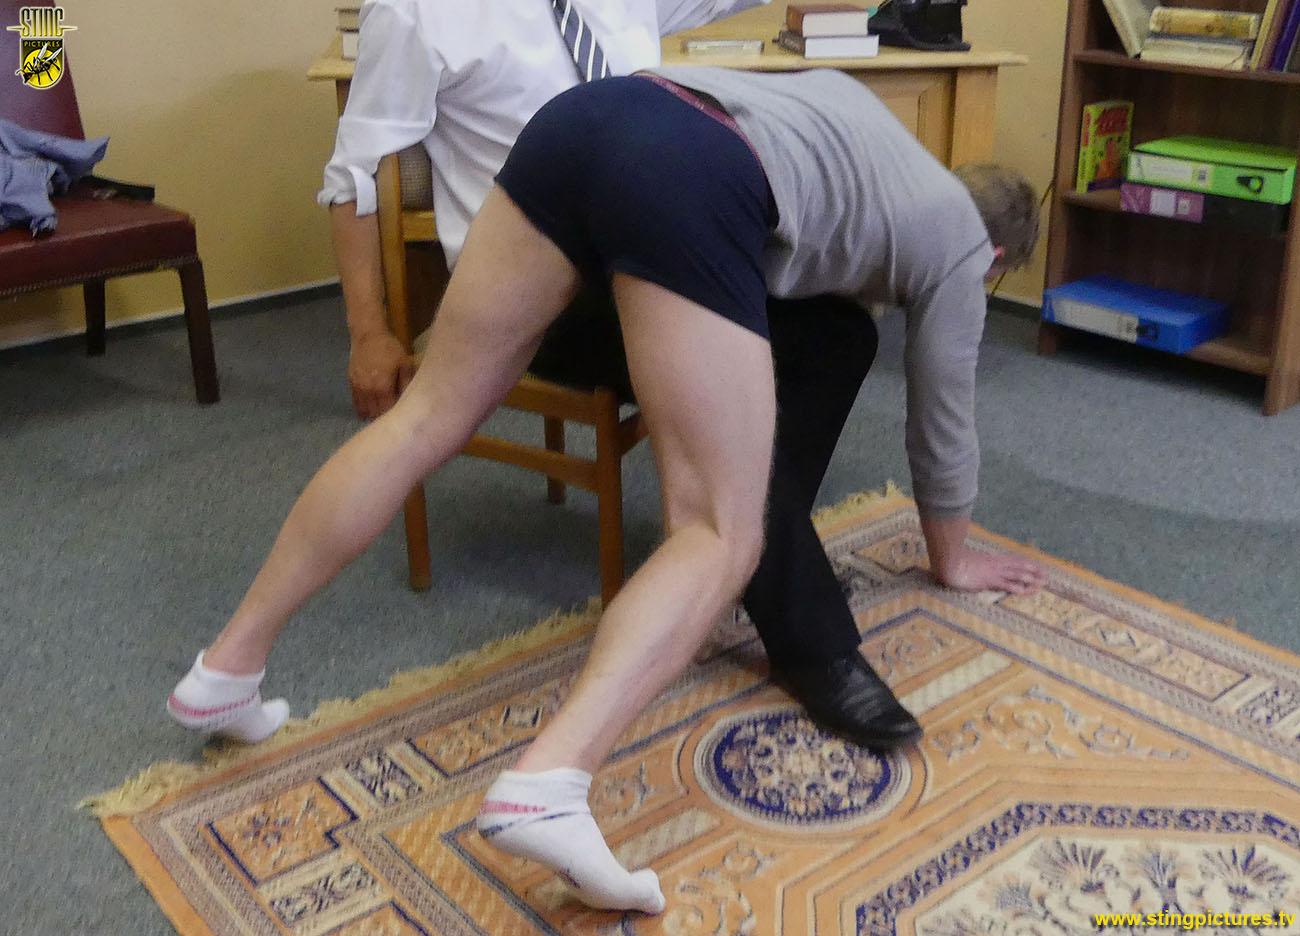 Principal spanks boy bare sex quality pic